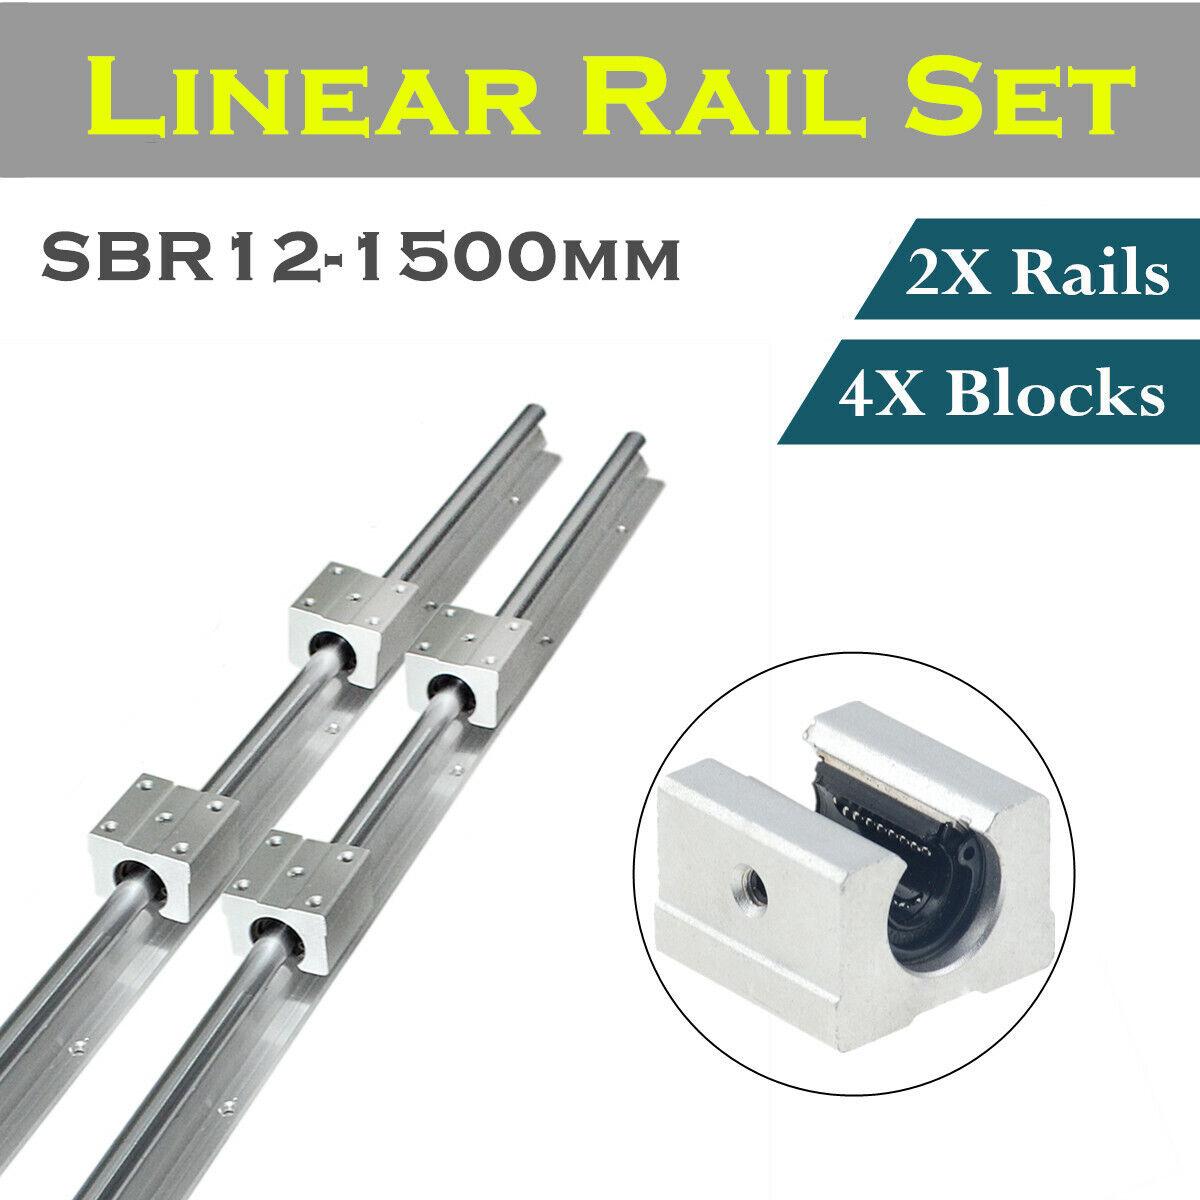 1Pcs SFU1204 Ballscrew Kit For CNC 3D Printer US Shipping SBR12 Linear Rail Set